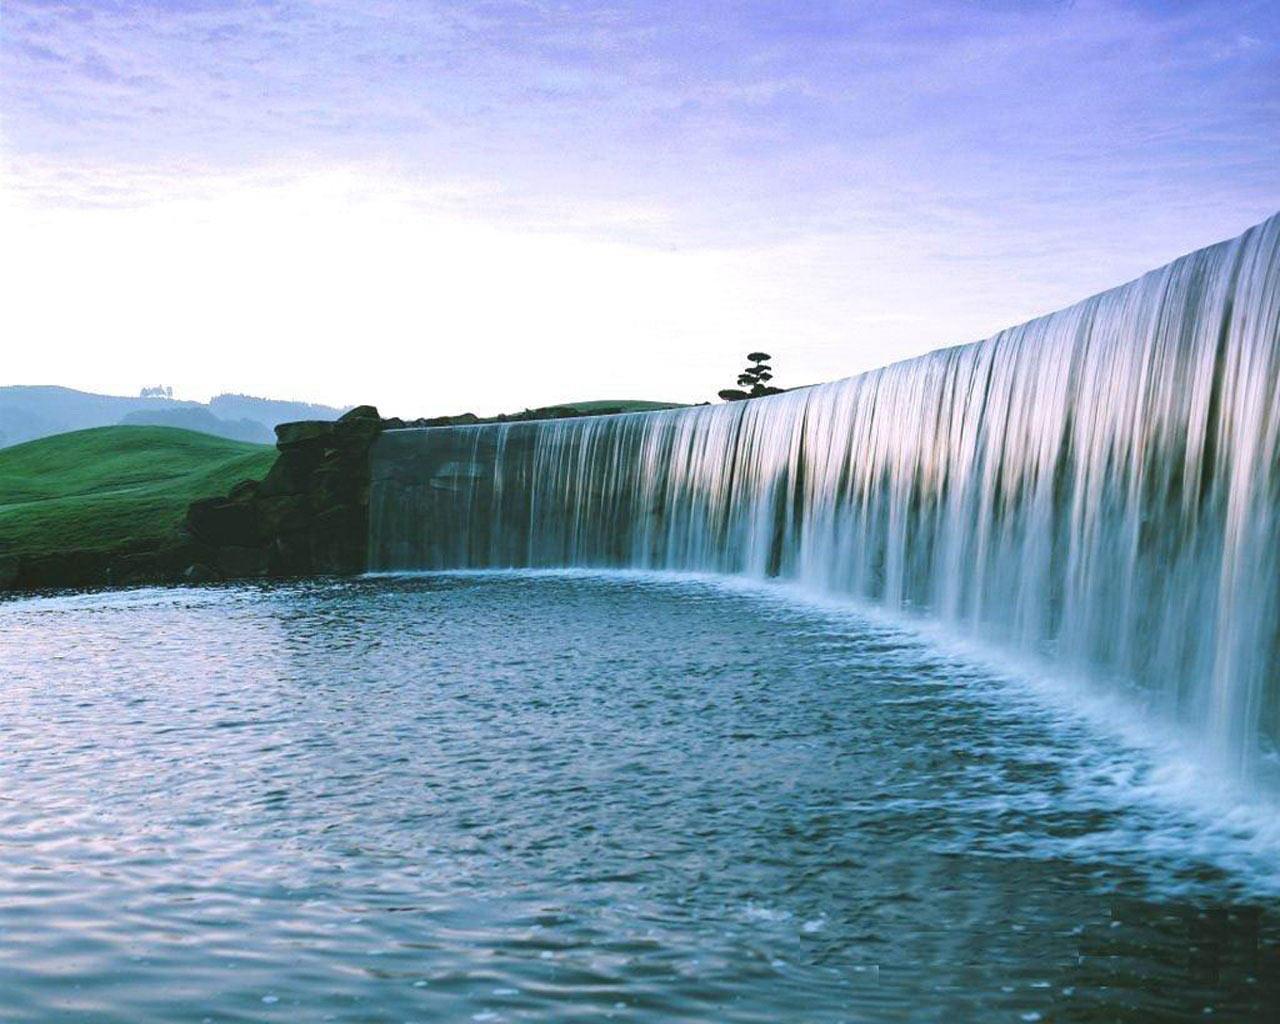 http://1.bp.blogspot.com/-kM1HWvB8i9g/T_MJYJenGGI/AAAAAAAAEFY/4NHIy67ccZ4/s1600/Waterfall-4-XOVYYPSKDW-1280x1024.jpg